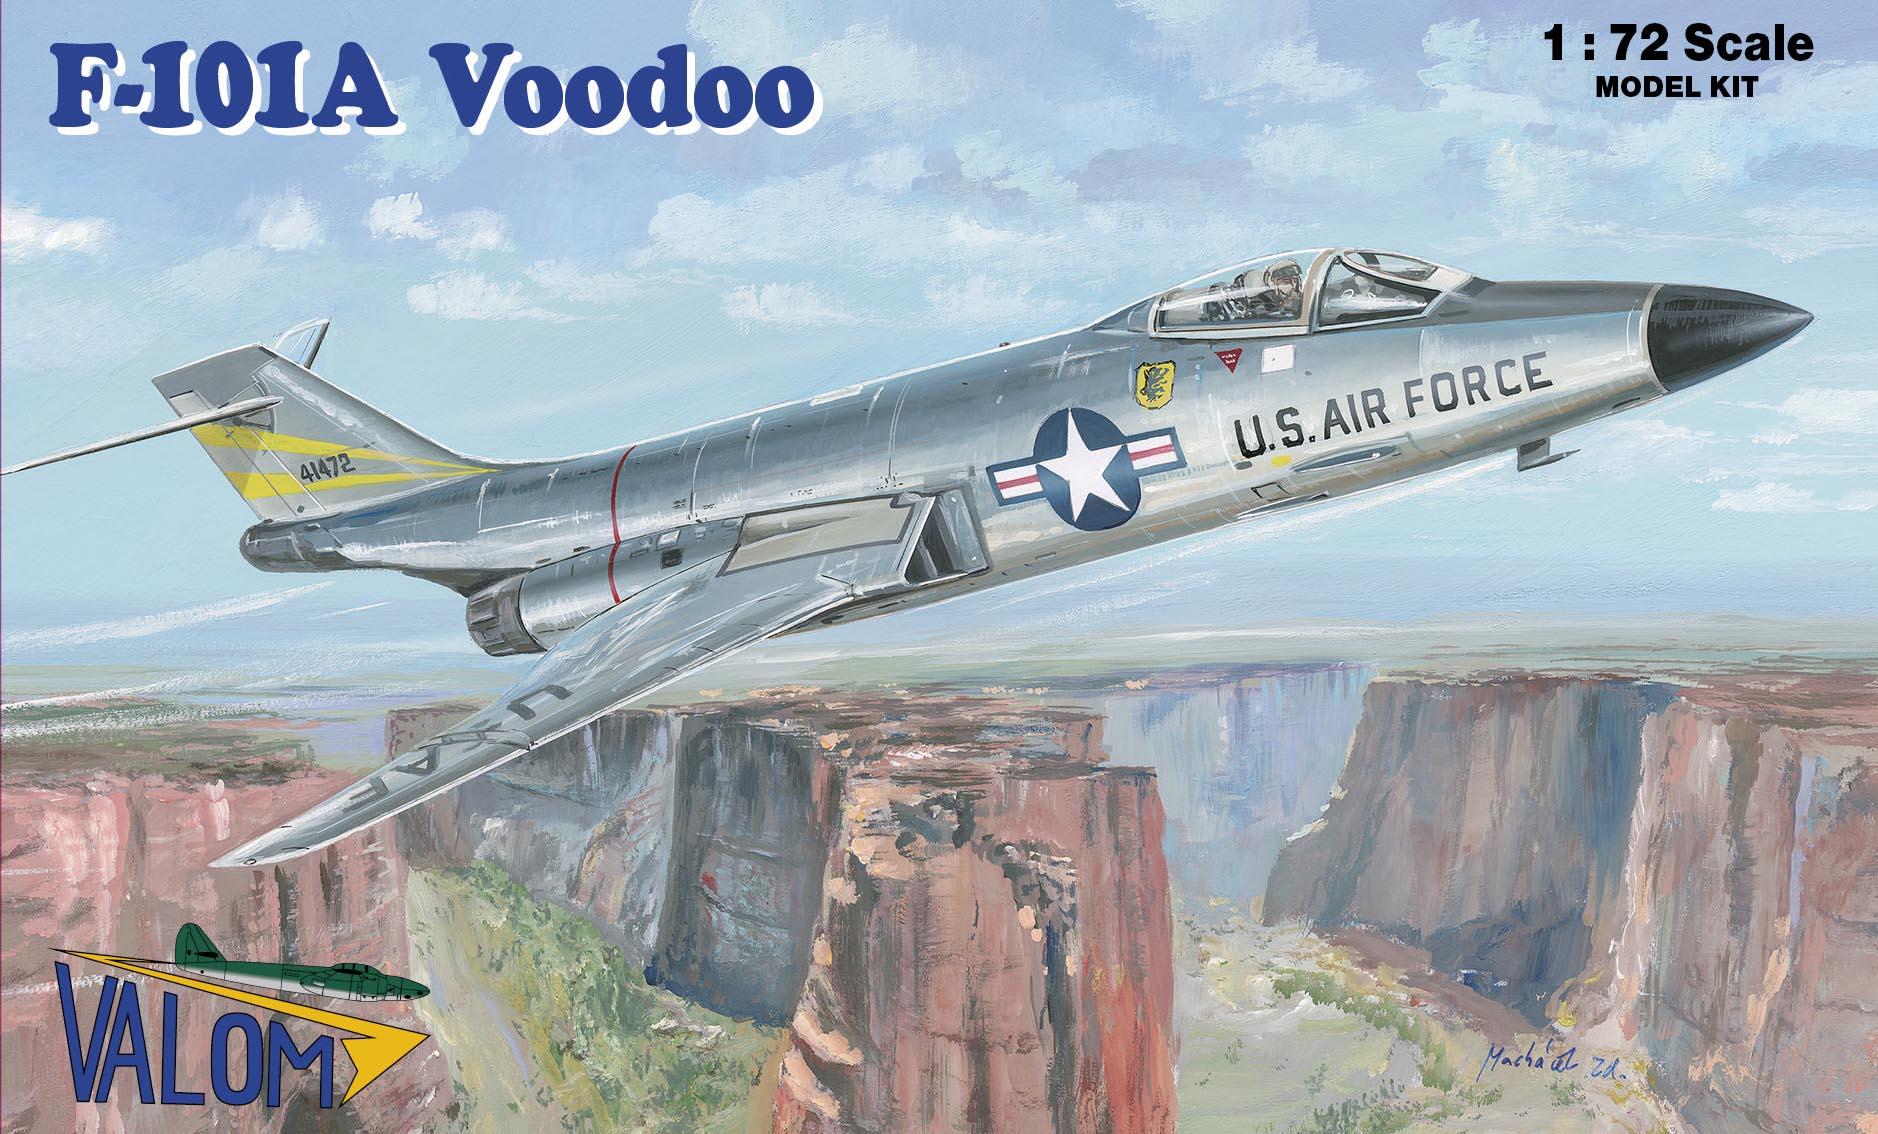 Valom F-101A Voodoo